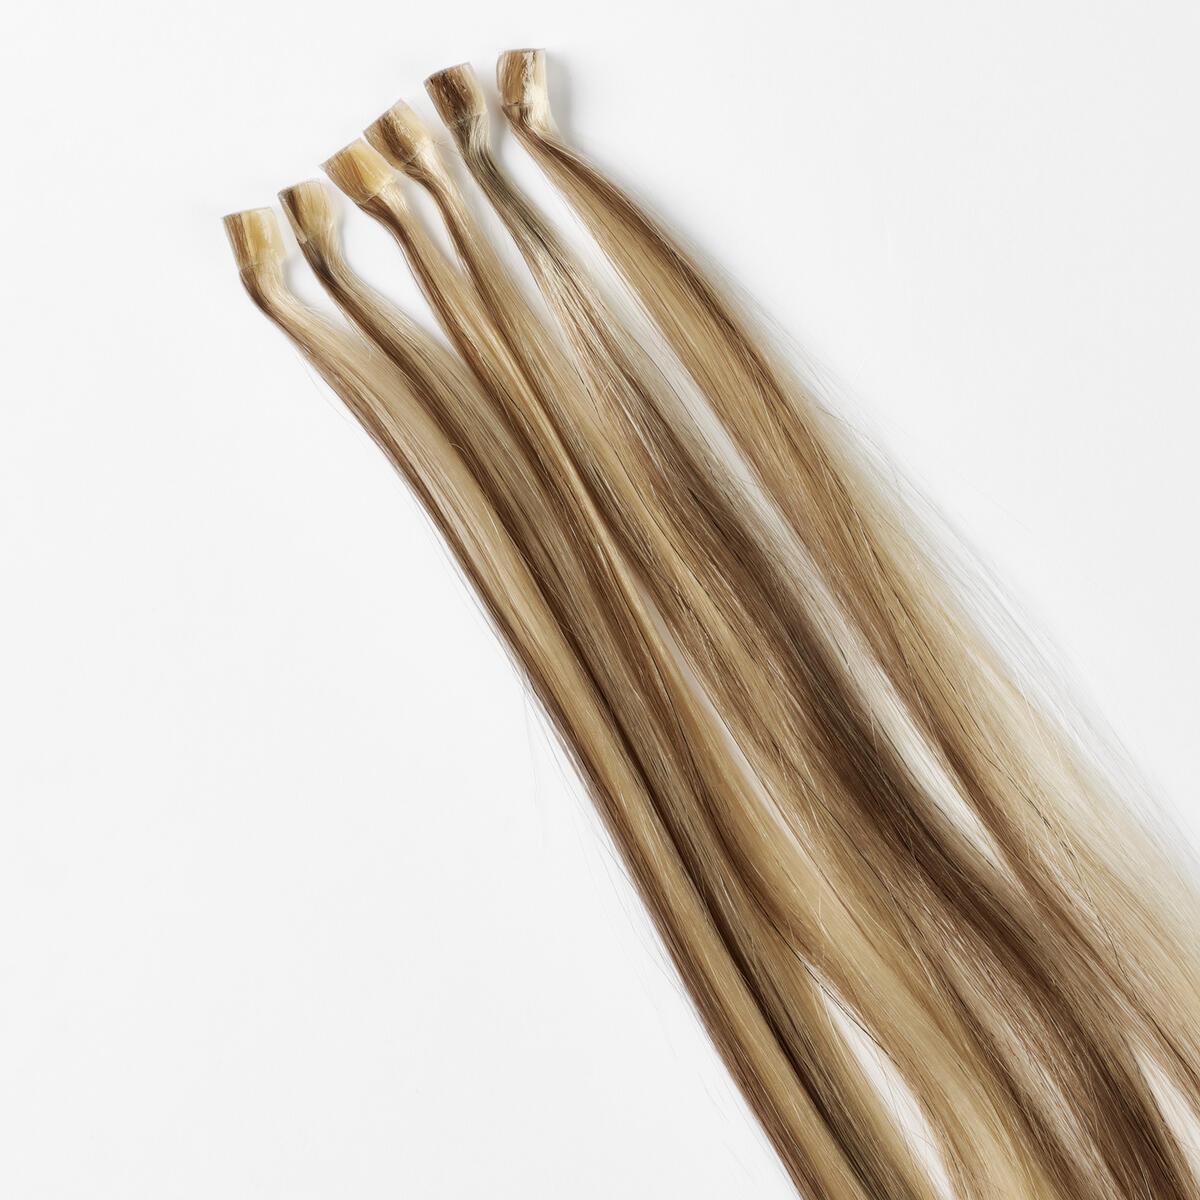 Nail Hair M7.1/10.8 Natural Ash Blonde Mix 30 cm